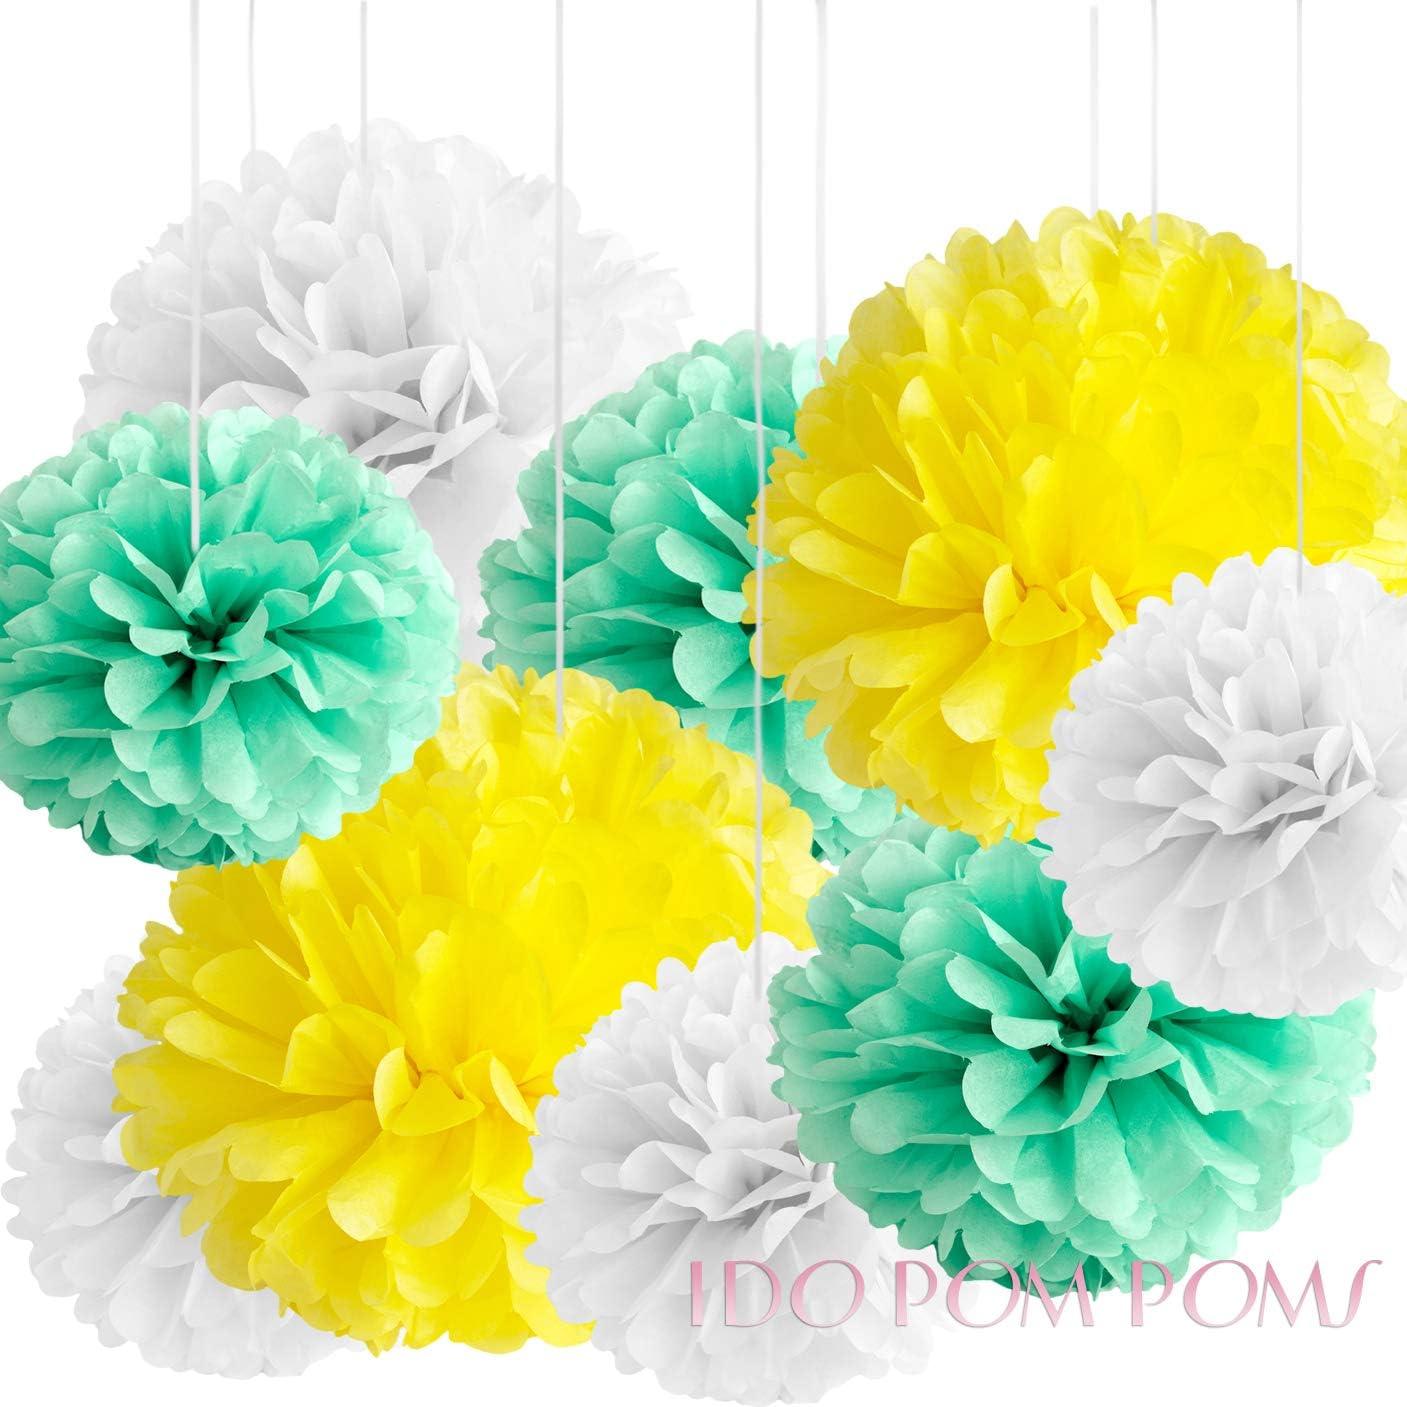 12 Pack Tissue Paper Pom Poms Flower Balls Wedding Baby Shower Party Birthday Hanging Decorations White, 8, 10, 15